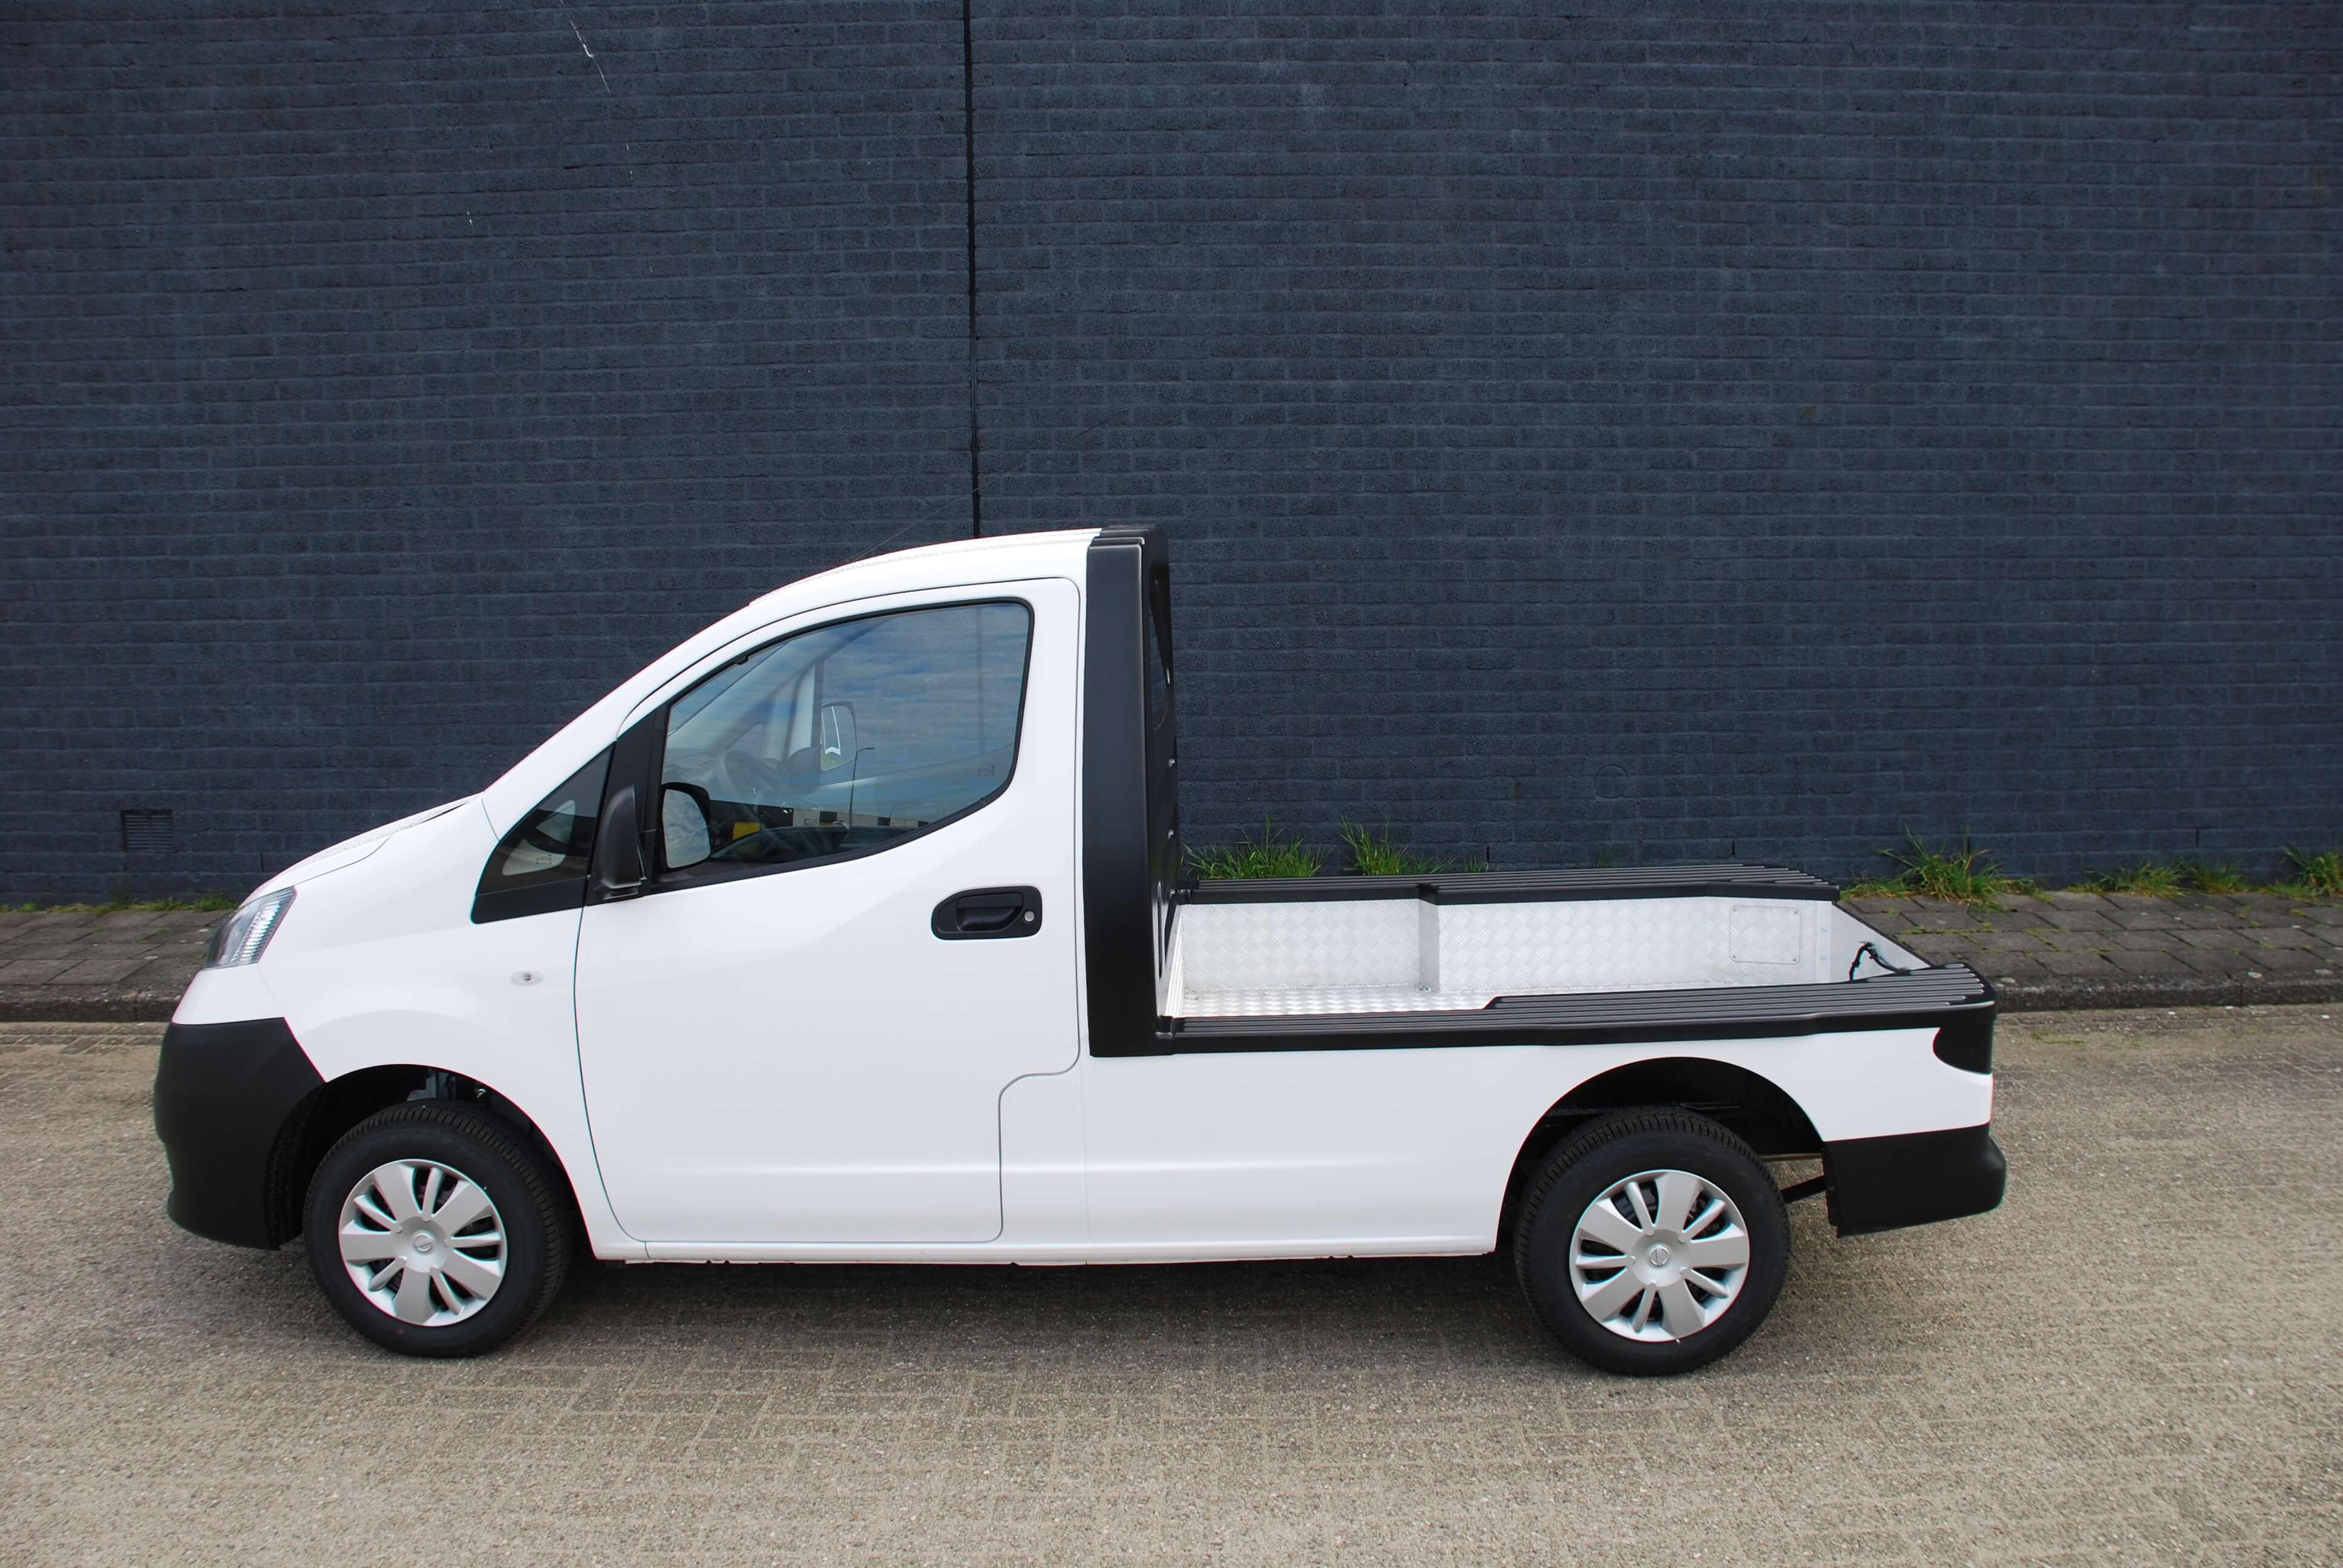 Chassis aanpassingen Nissan e-NV200 pick-up basis